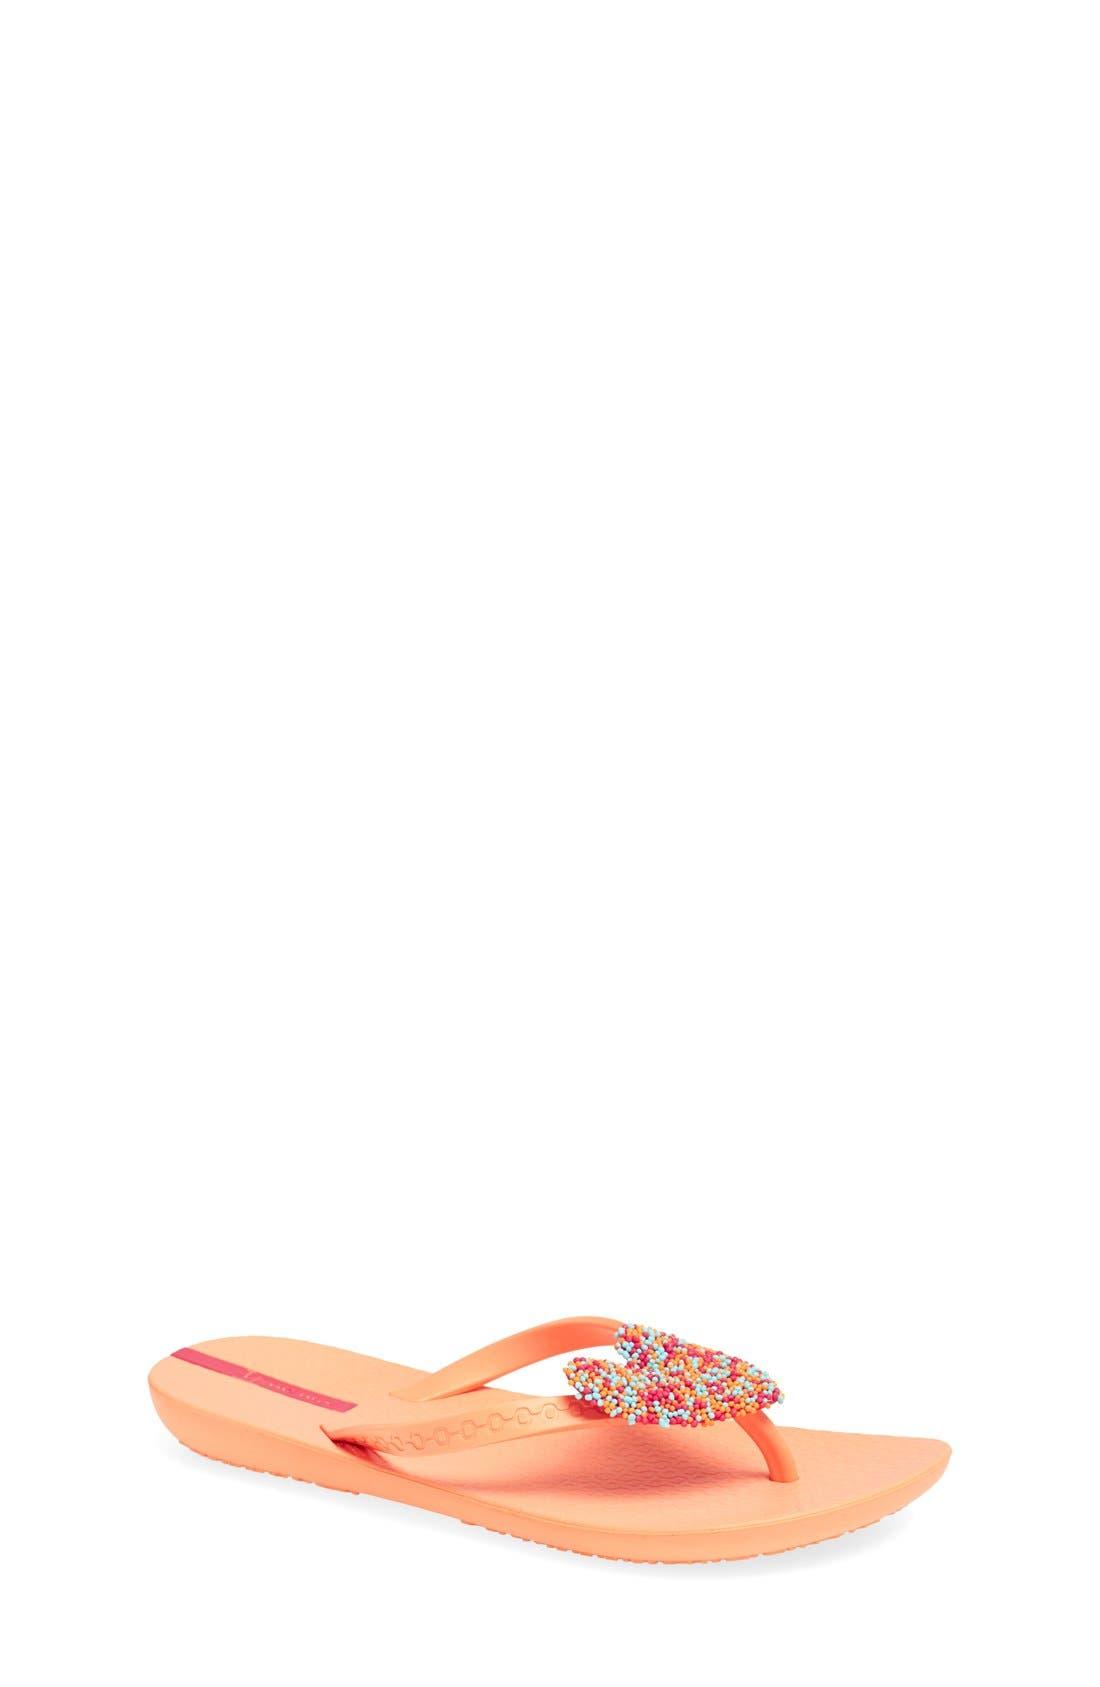 Alternate Image 1 Selected - Ipanema 'Summer Love' Flip Flop (Toddler & Little Kid)